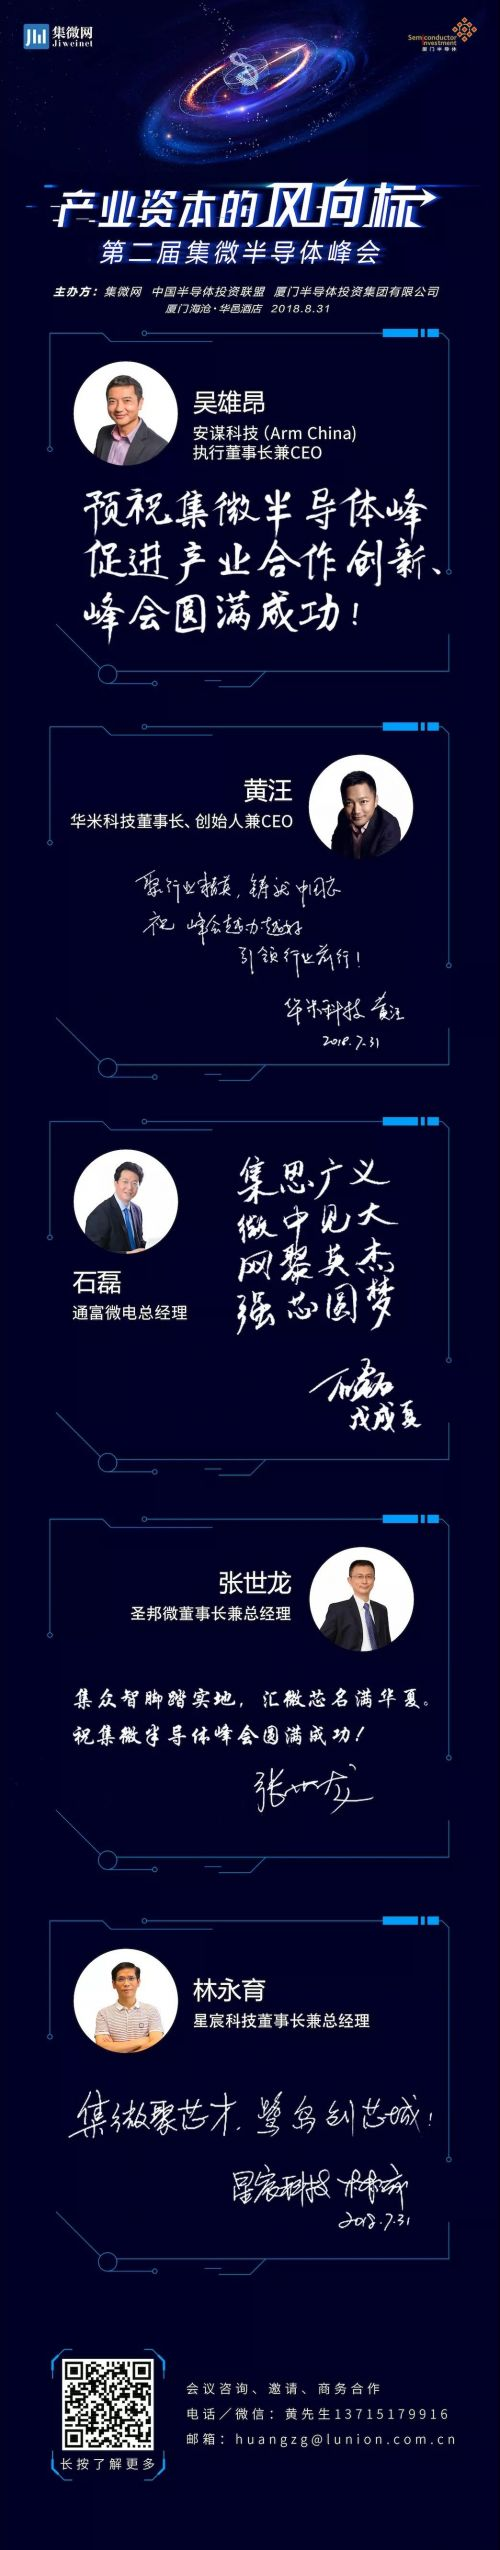 Arm吴雄昂、黄汪、石磊、张世龙、林永育寄语峰会6